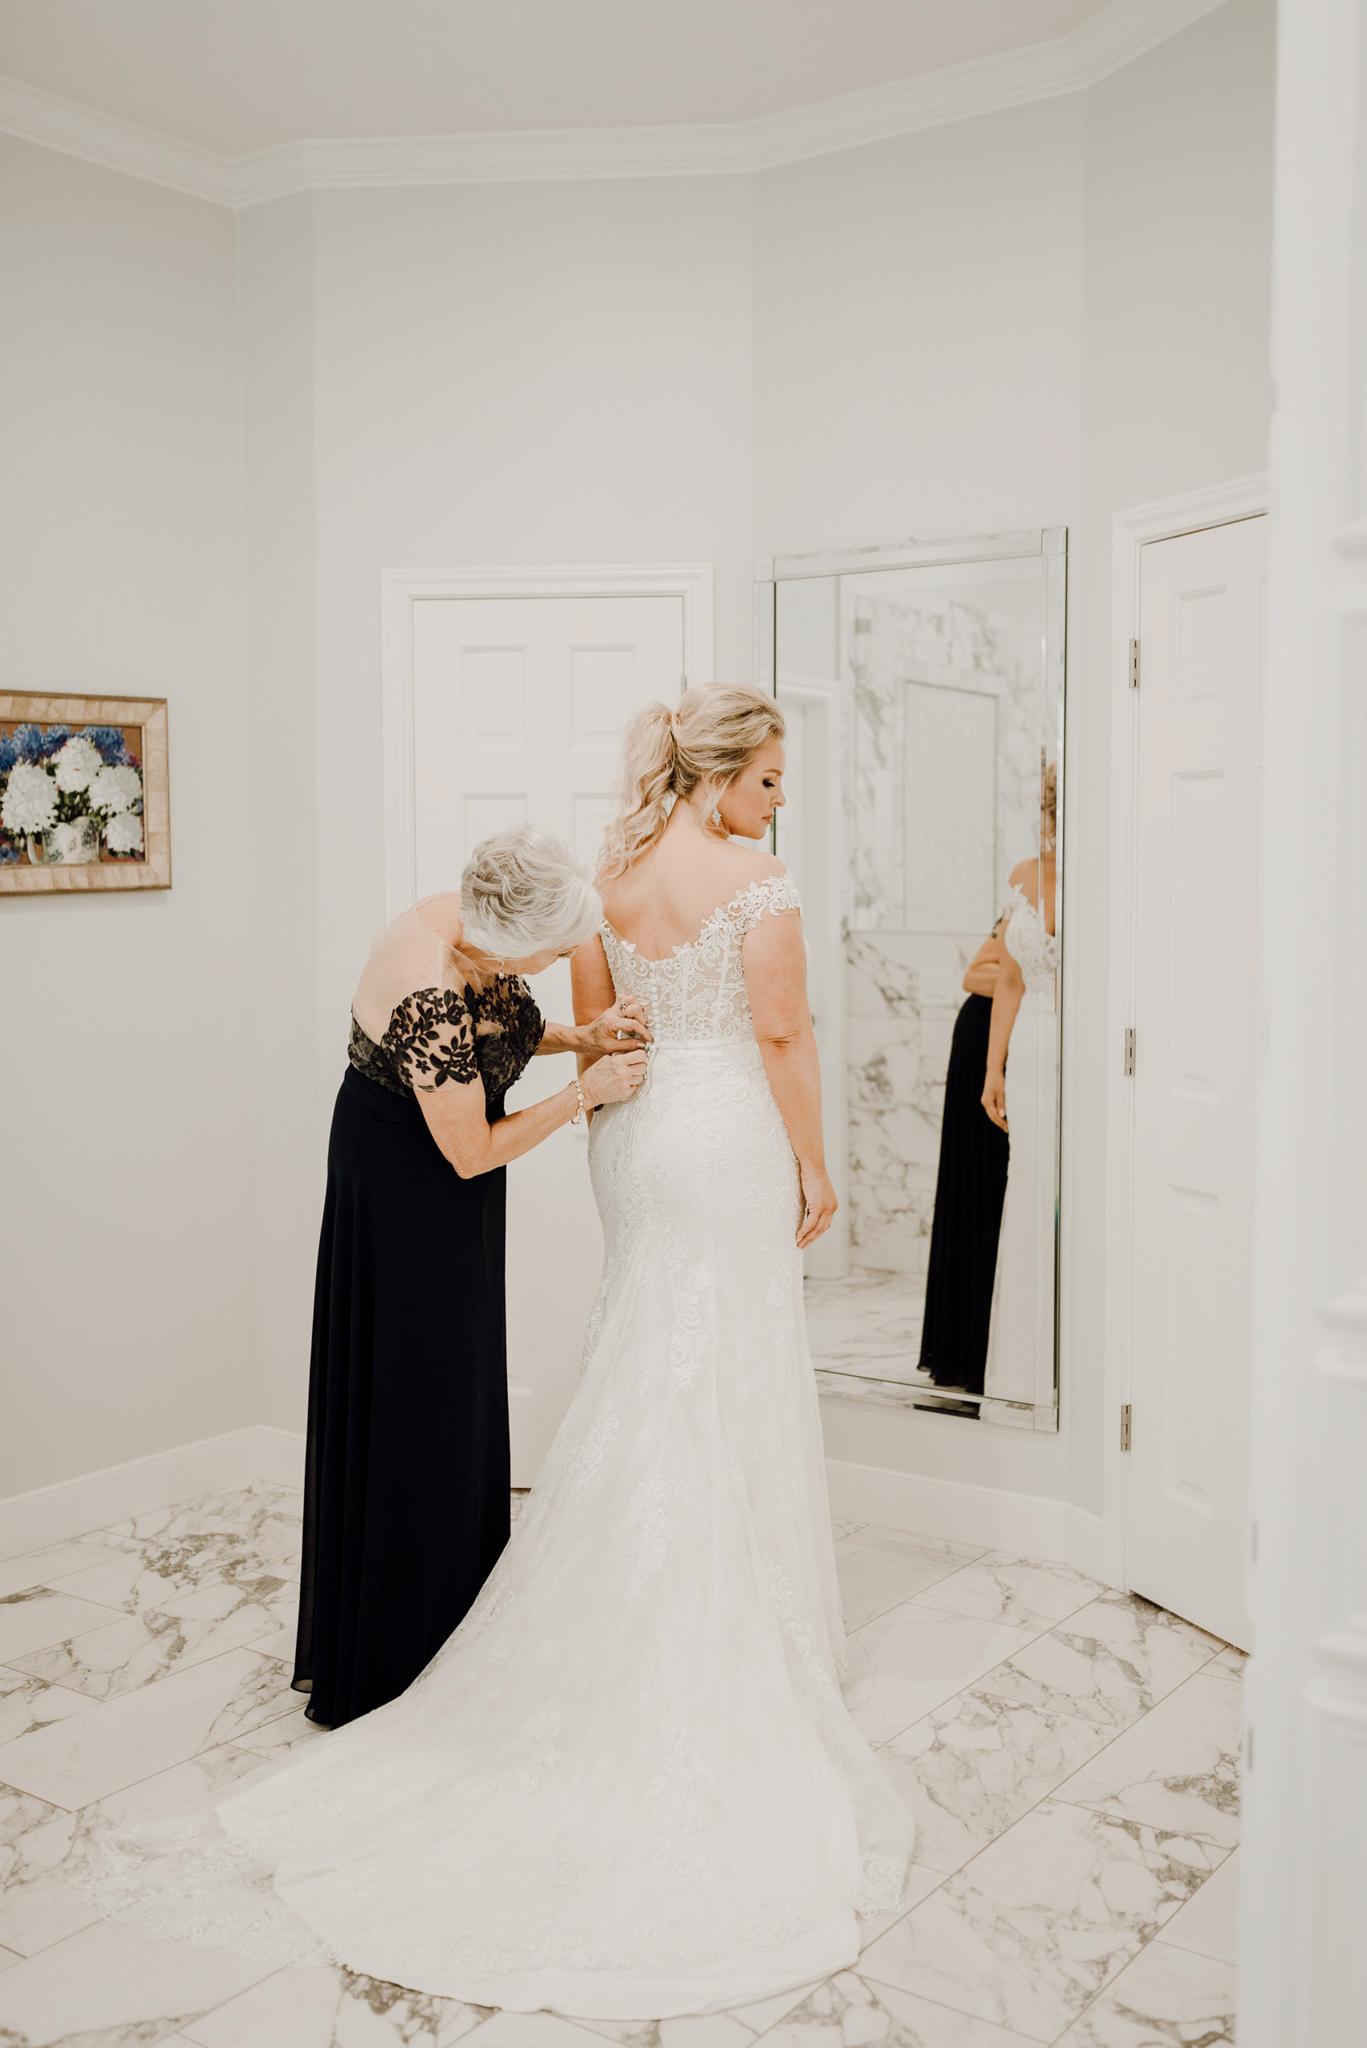 Houston Wedding Photographer-Intimate Texas Backyard Wedding- Houston Wedding Photographer -Kristen Giles Photography-23.jpg